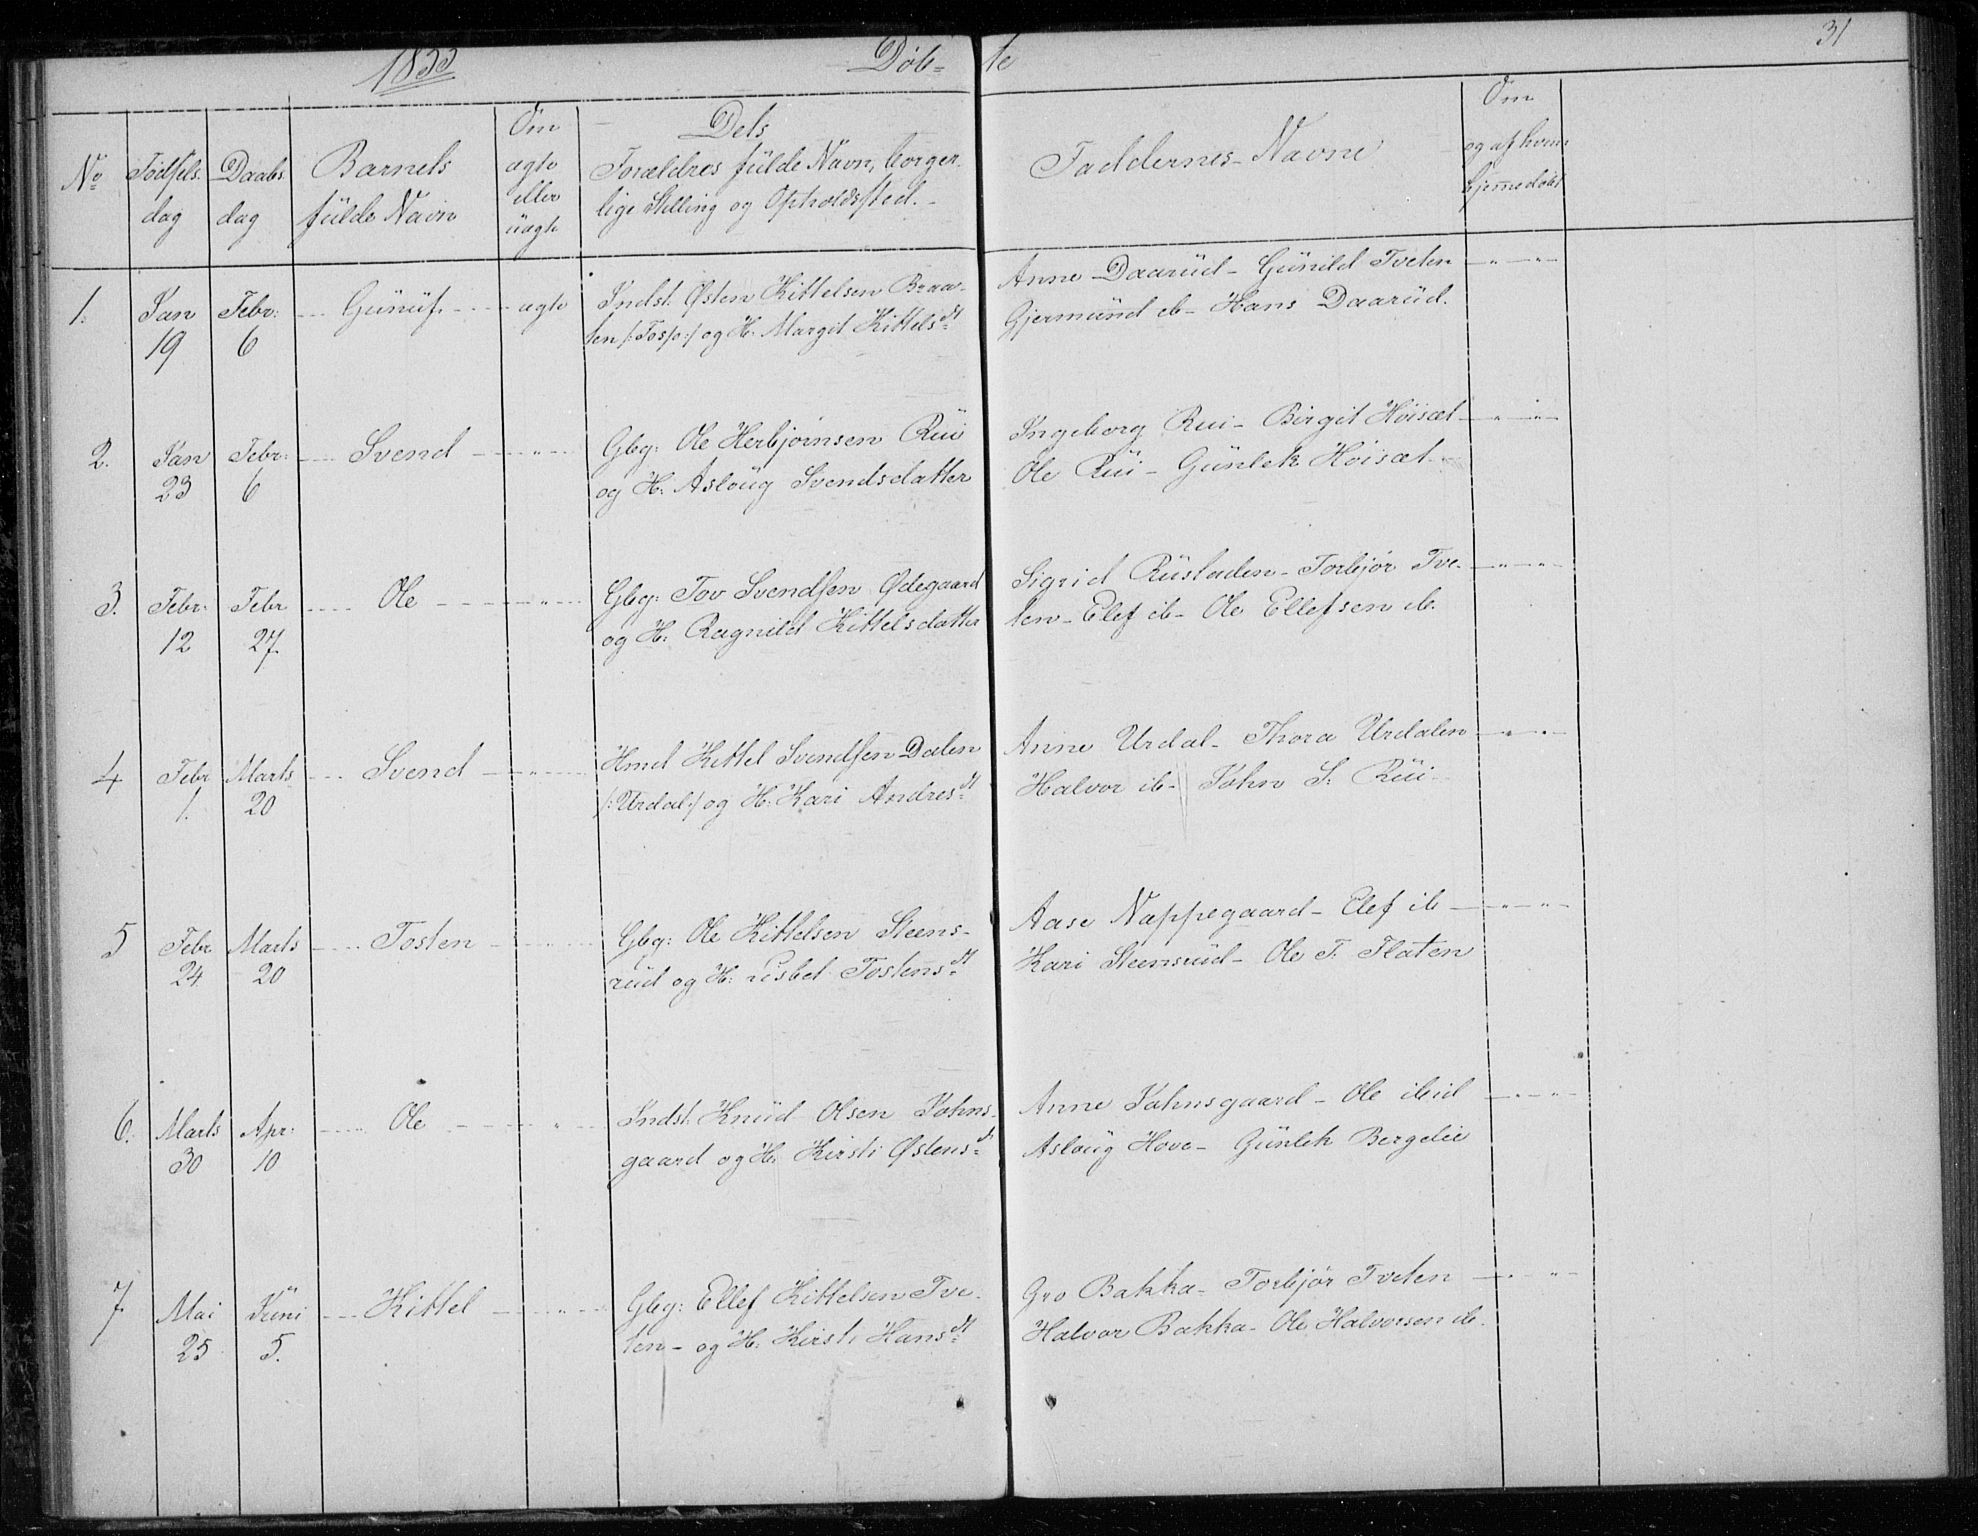 SAKO, Gransherad kirkebøker, F/Fb/L0003: Ministerialbok nr. II 3, 1844-1859, s. 31